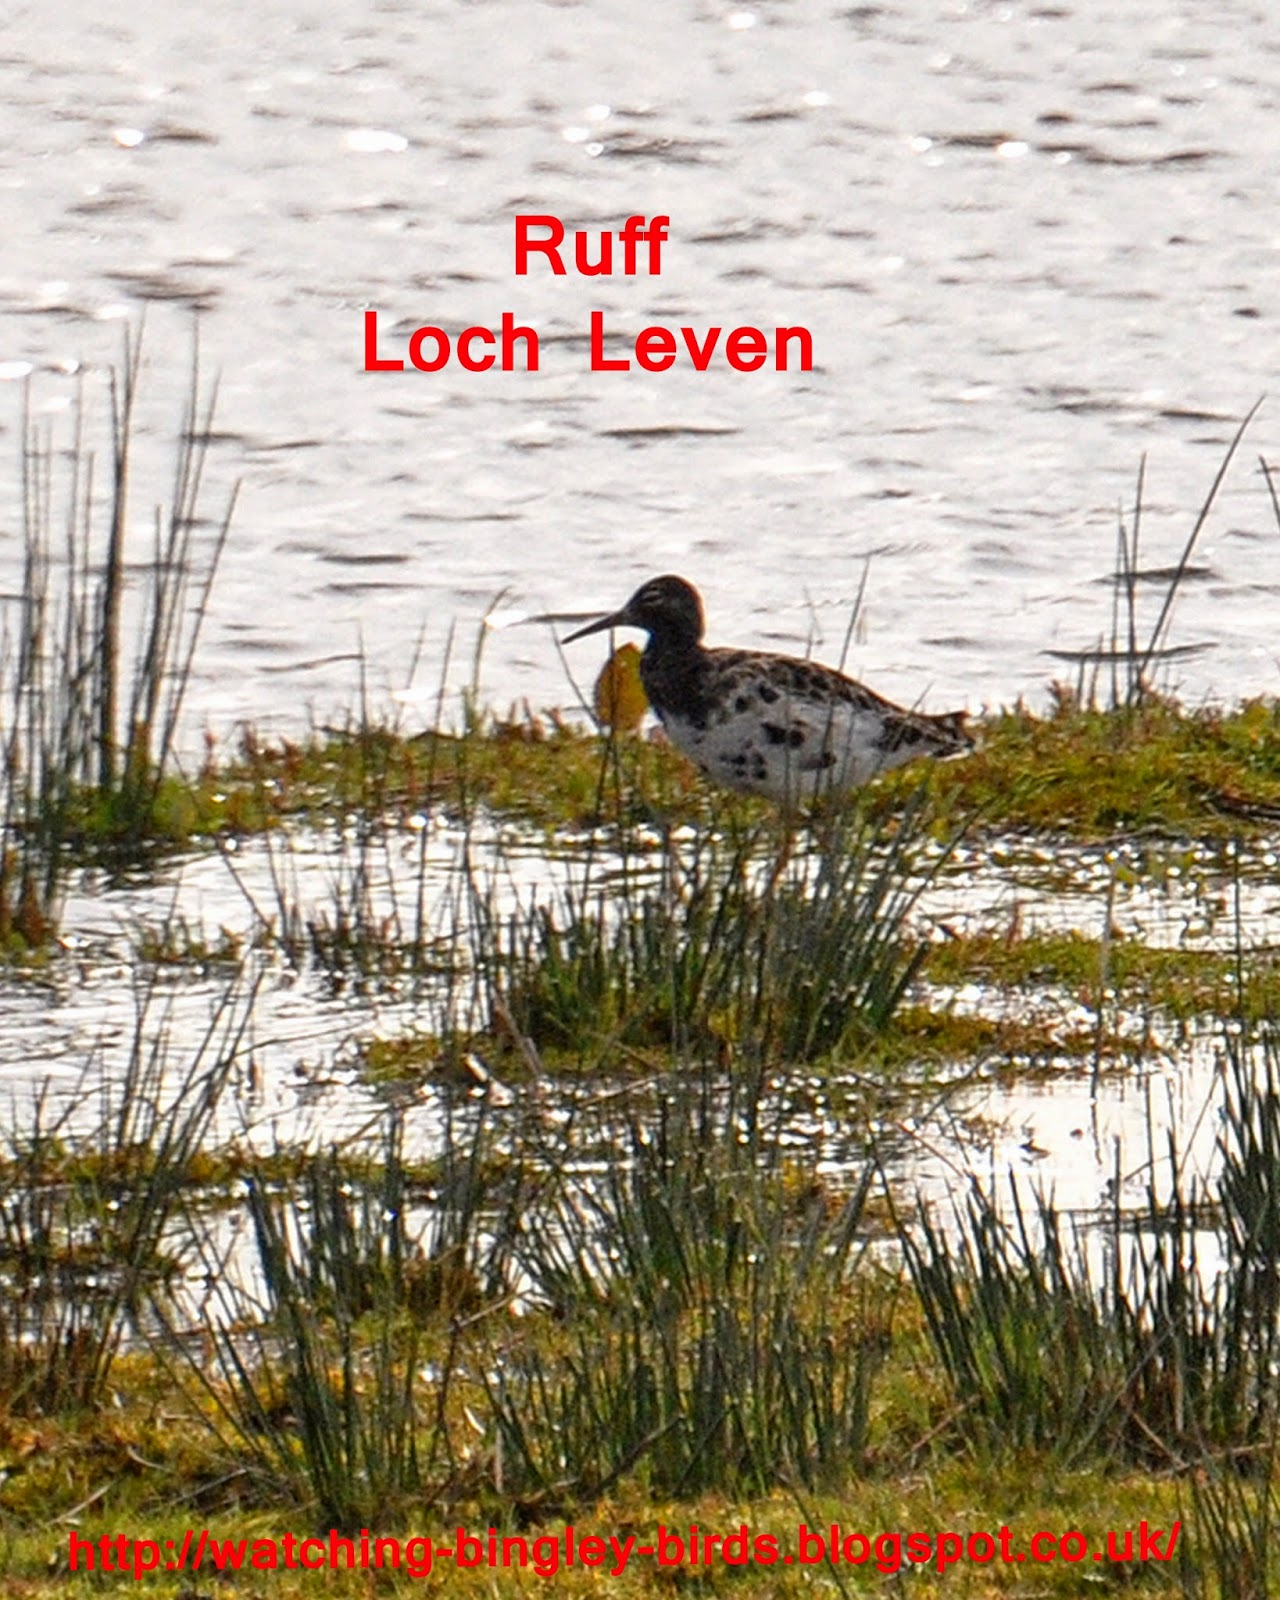 Ruff at Loch Leven